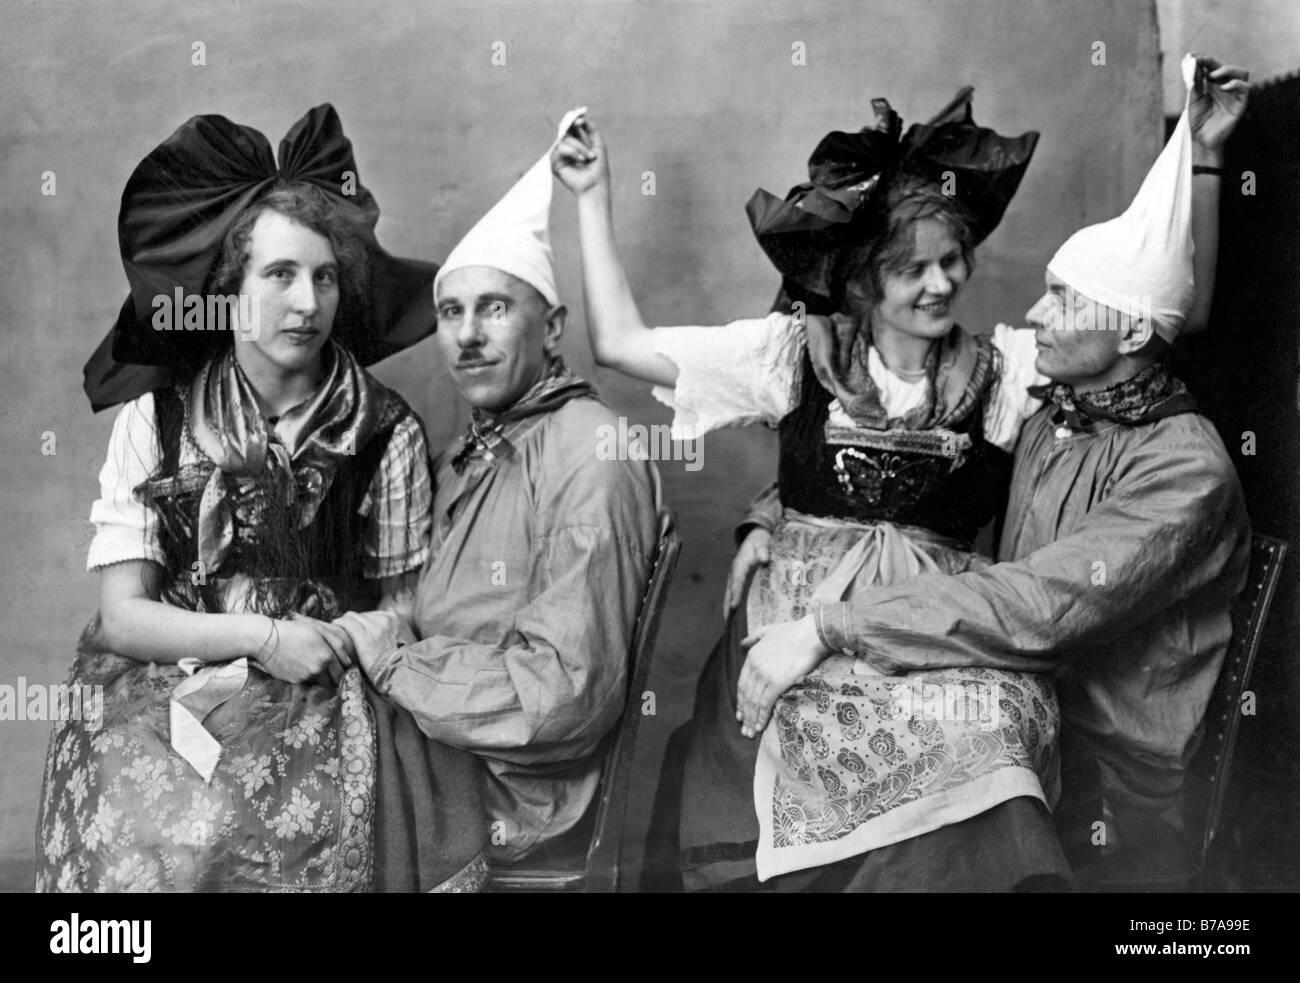 Historisches Foto, Costume national Gruppe, ca. 1920 Stockbild